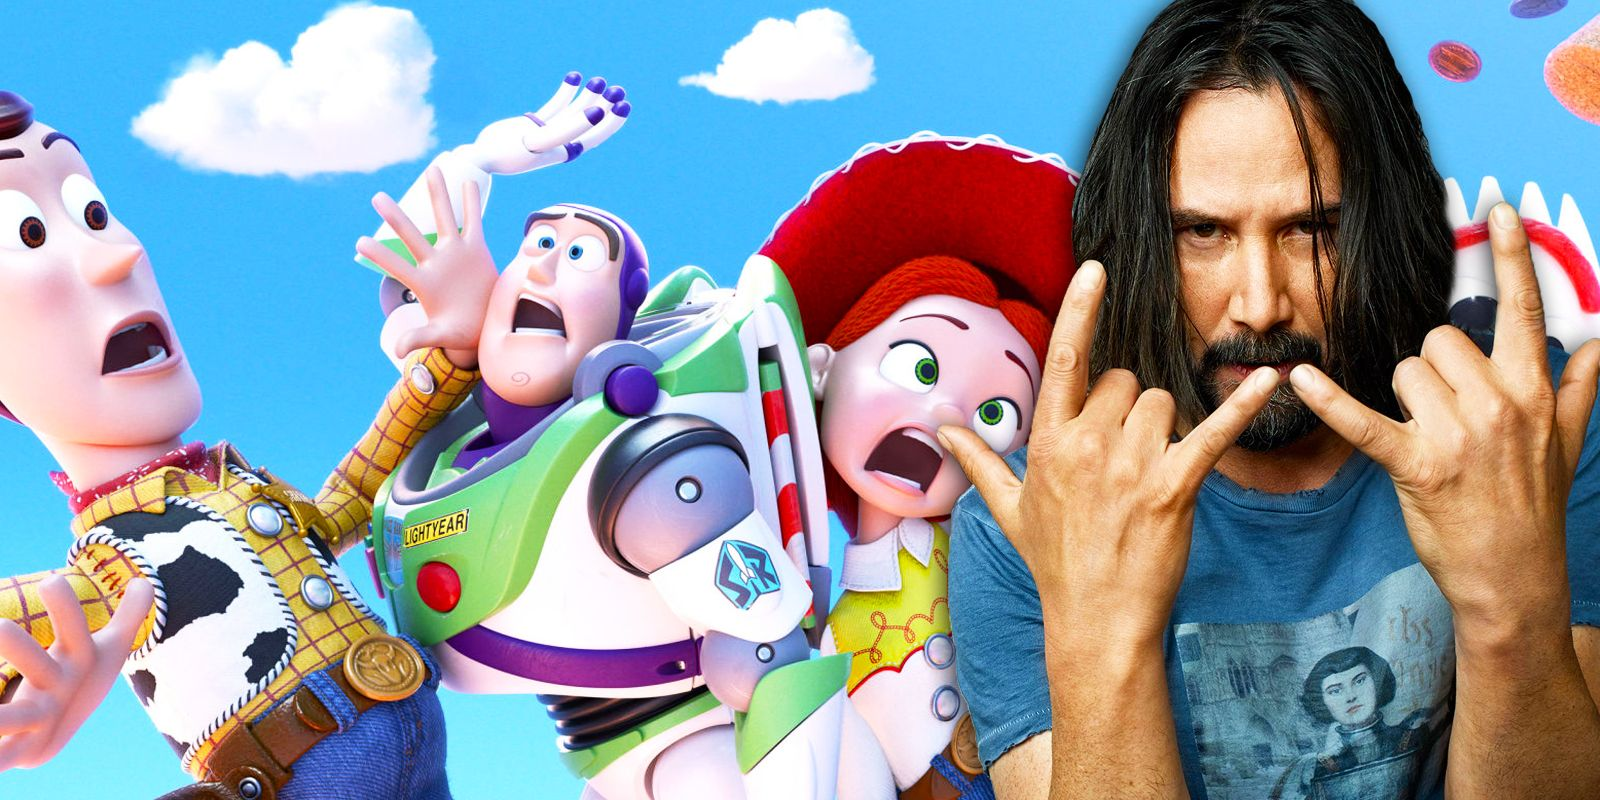 Toy Story 4 Promo Spotlights Keanu Reeves' Duke Caboom